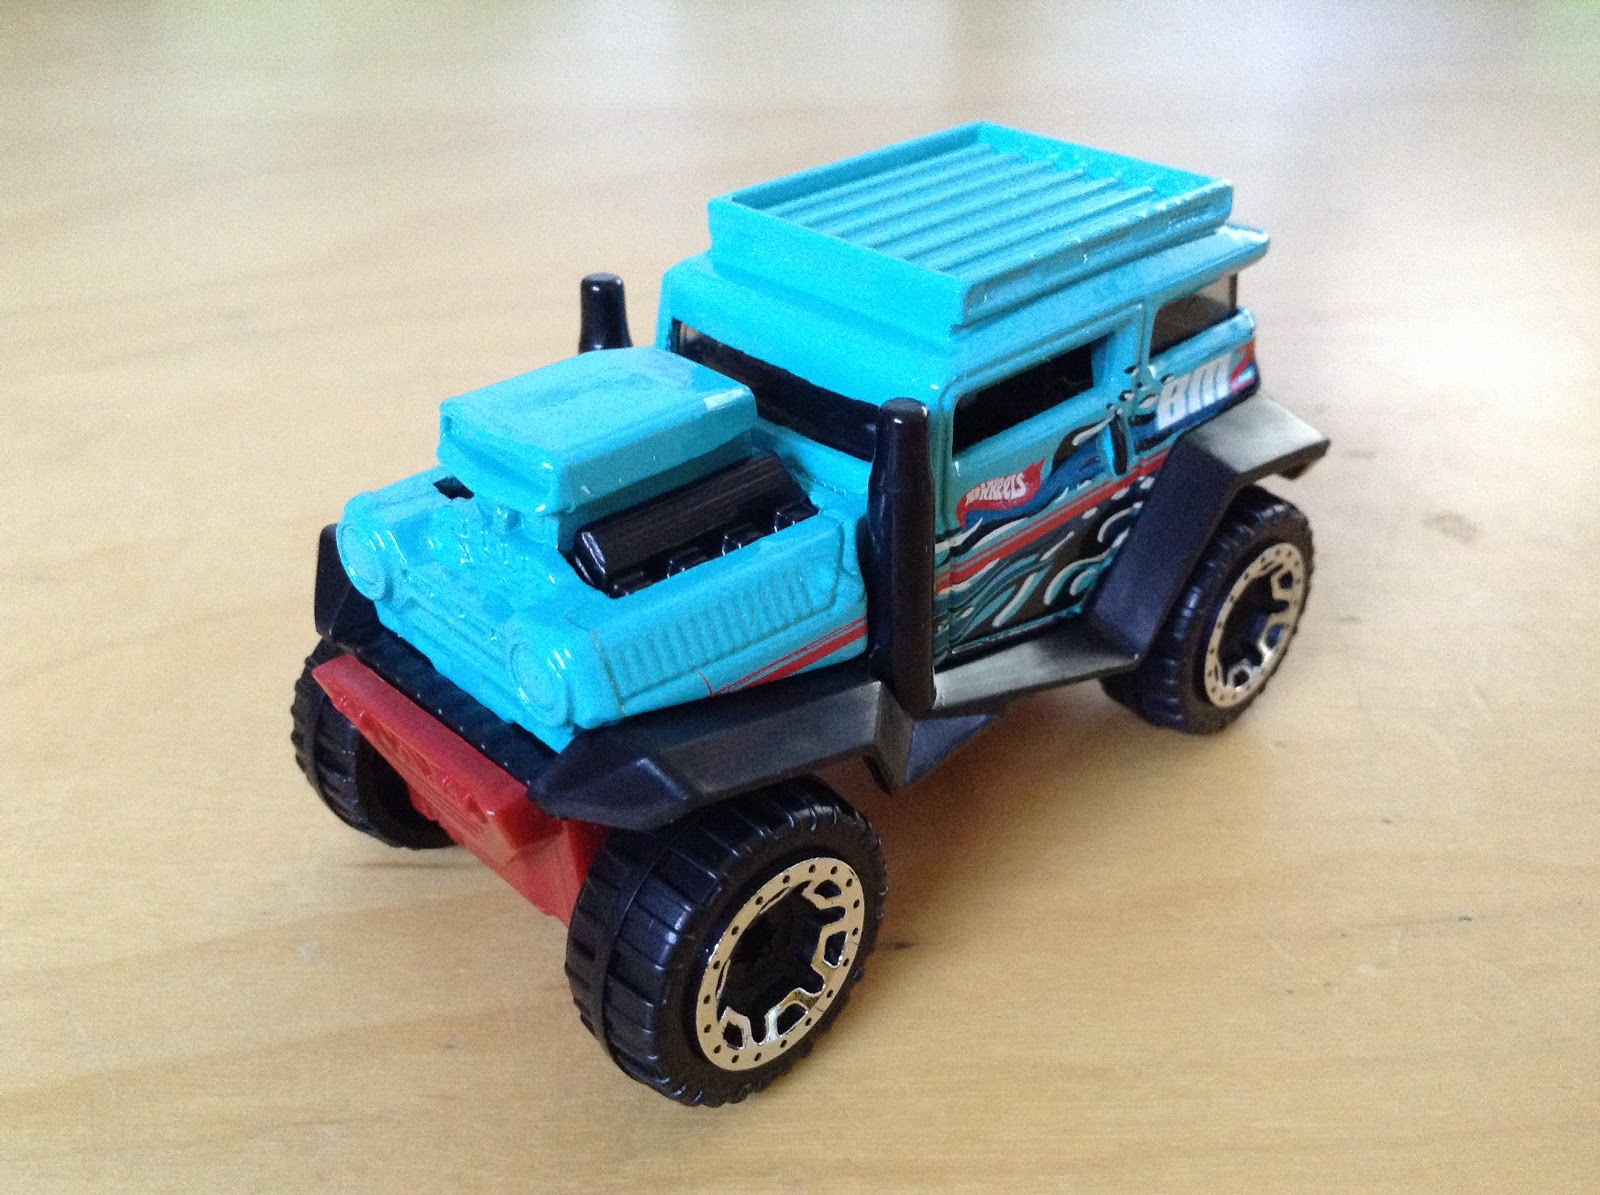 JULIANS HOT WHEELS BLOG: Bad Mudder 2 (2016 HW Hot Trucks)